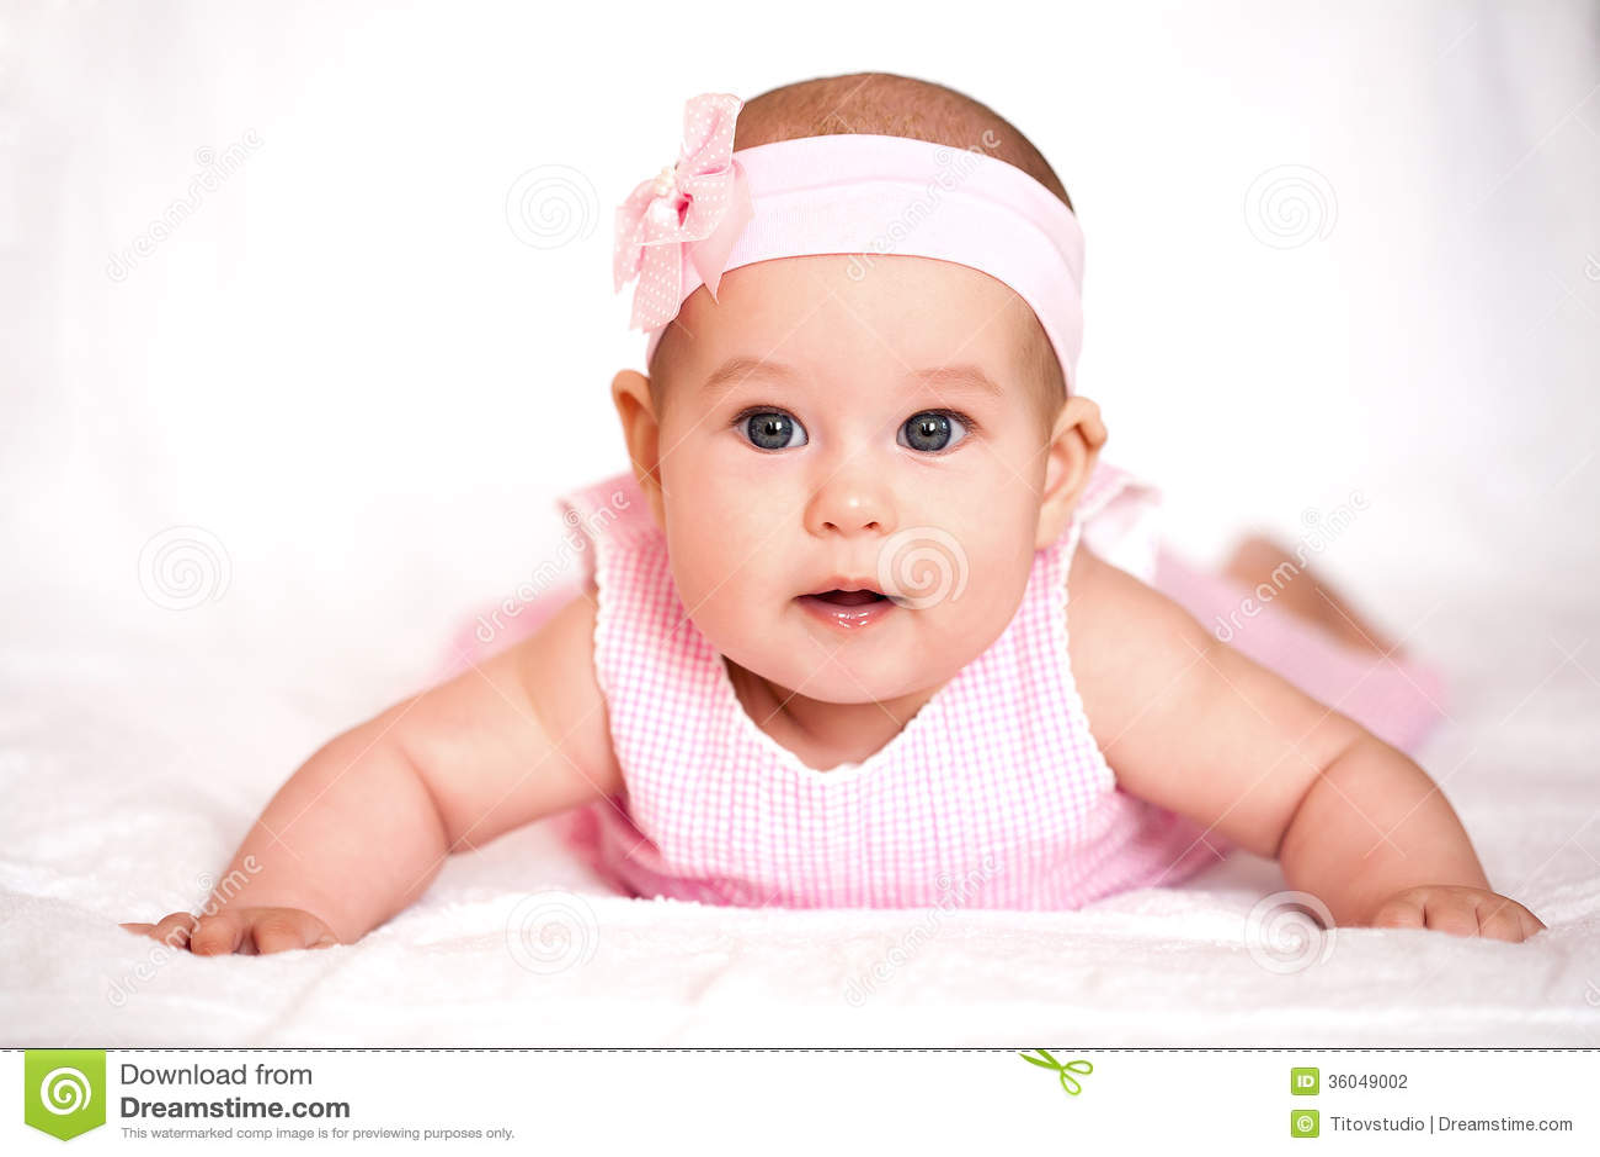 image pink cute girl - photo #43